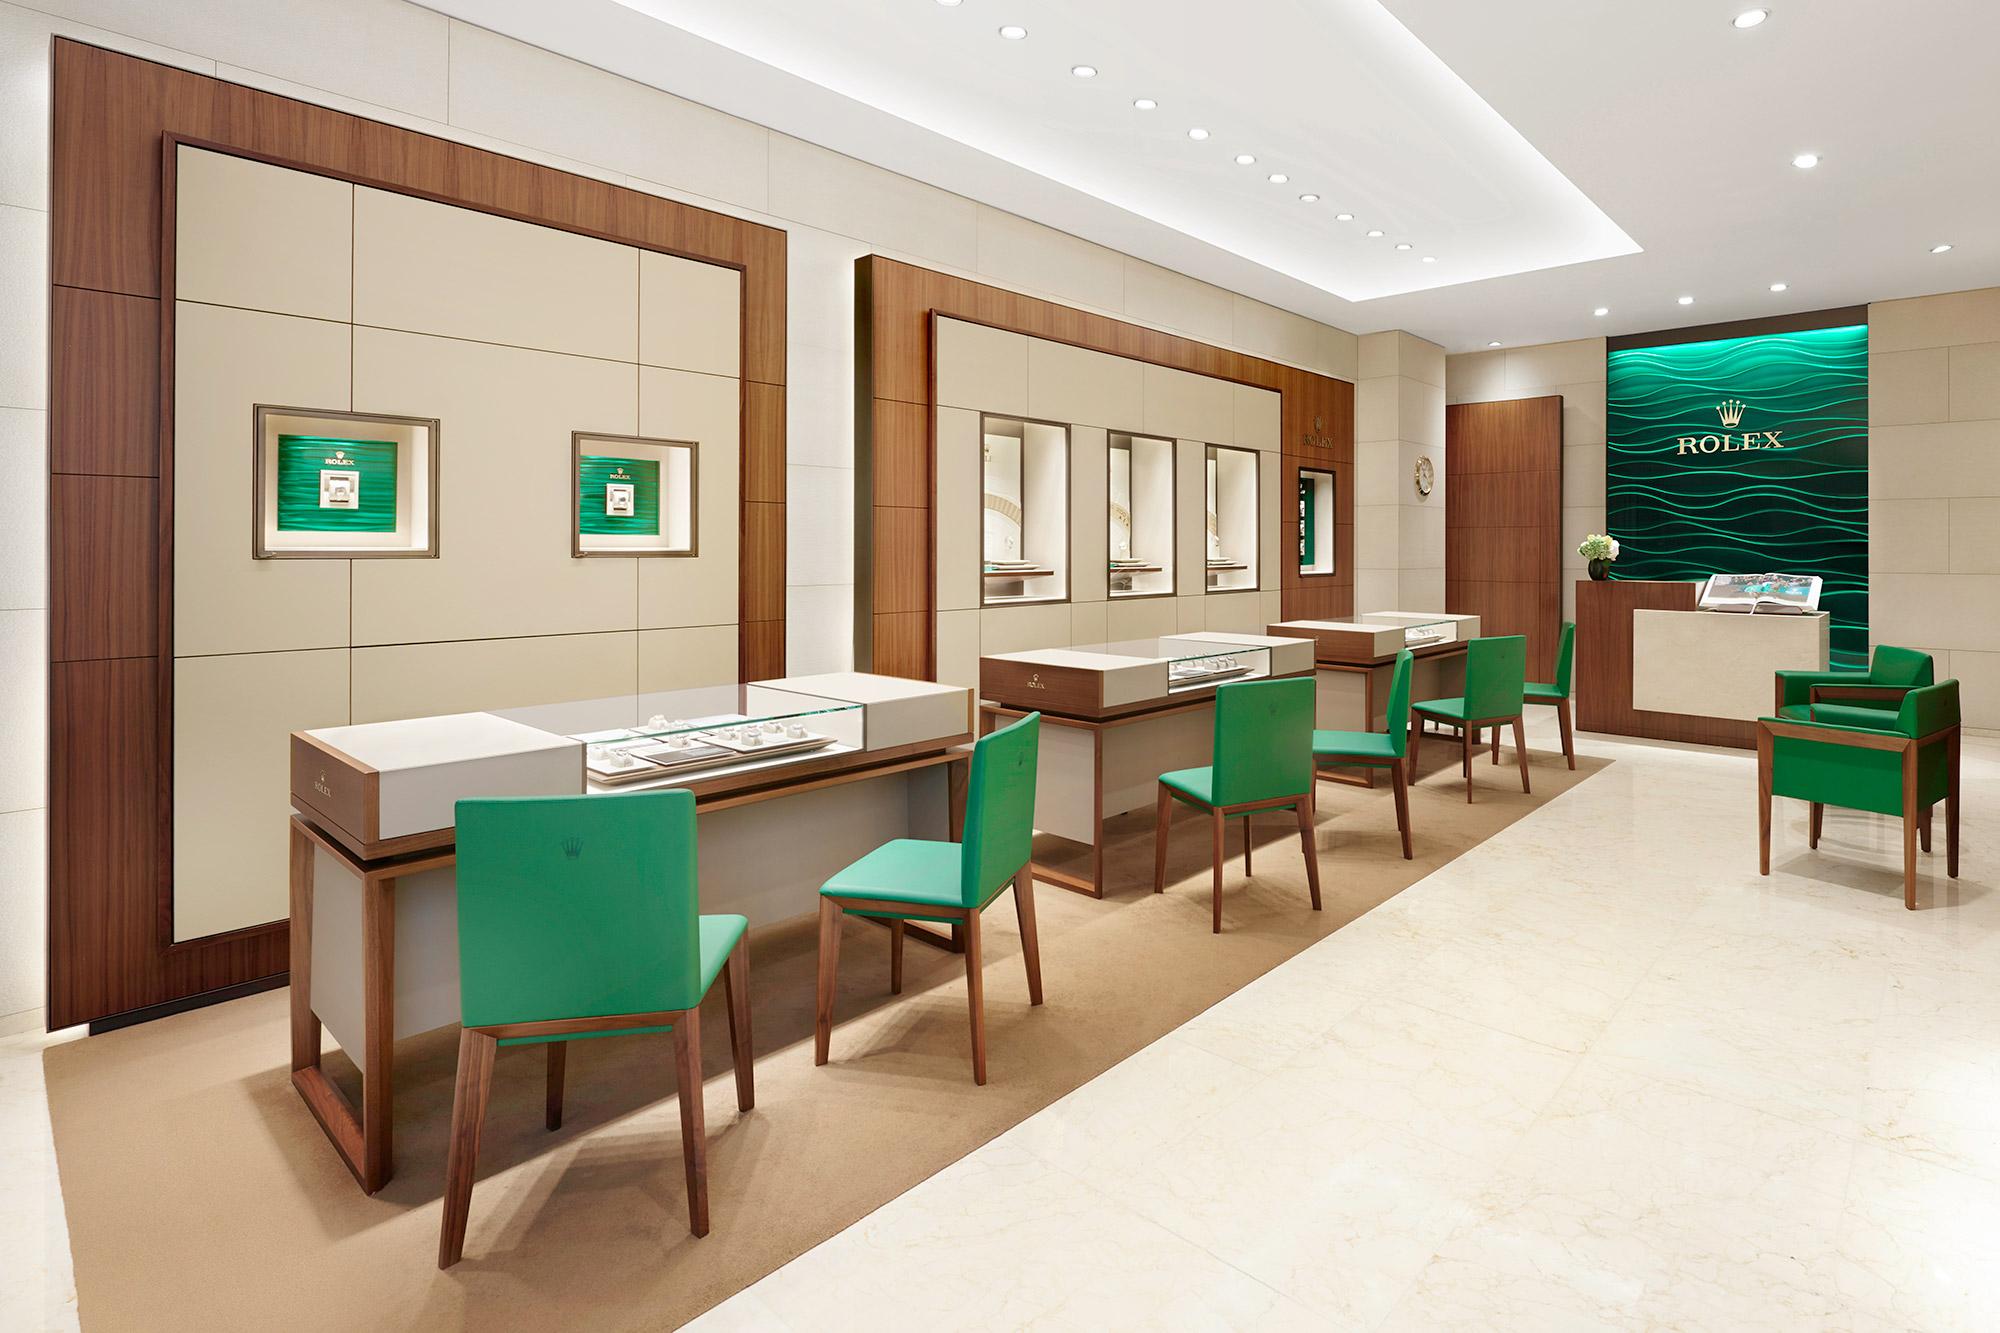 Inside Siam Swiss Central Bangna Rolex Boutique